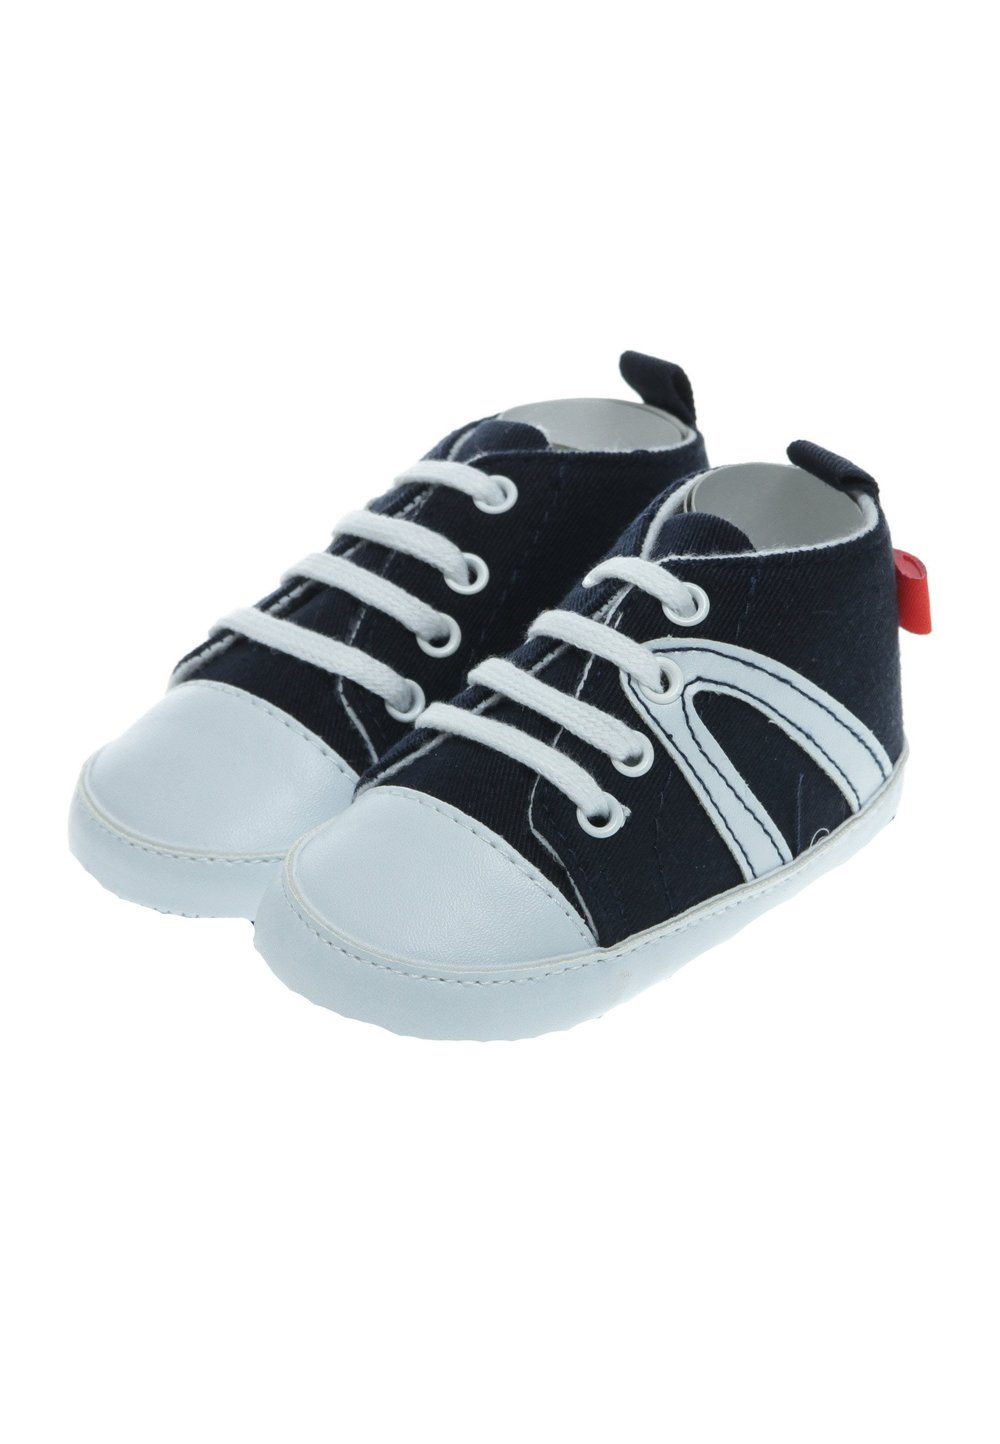 Papucei bebe din blug, albastri imagine